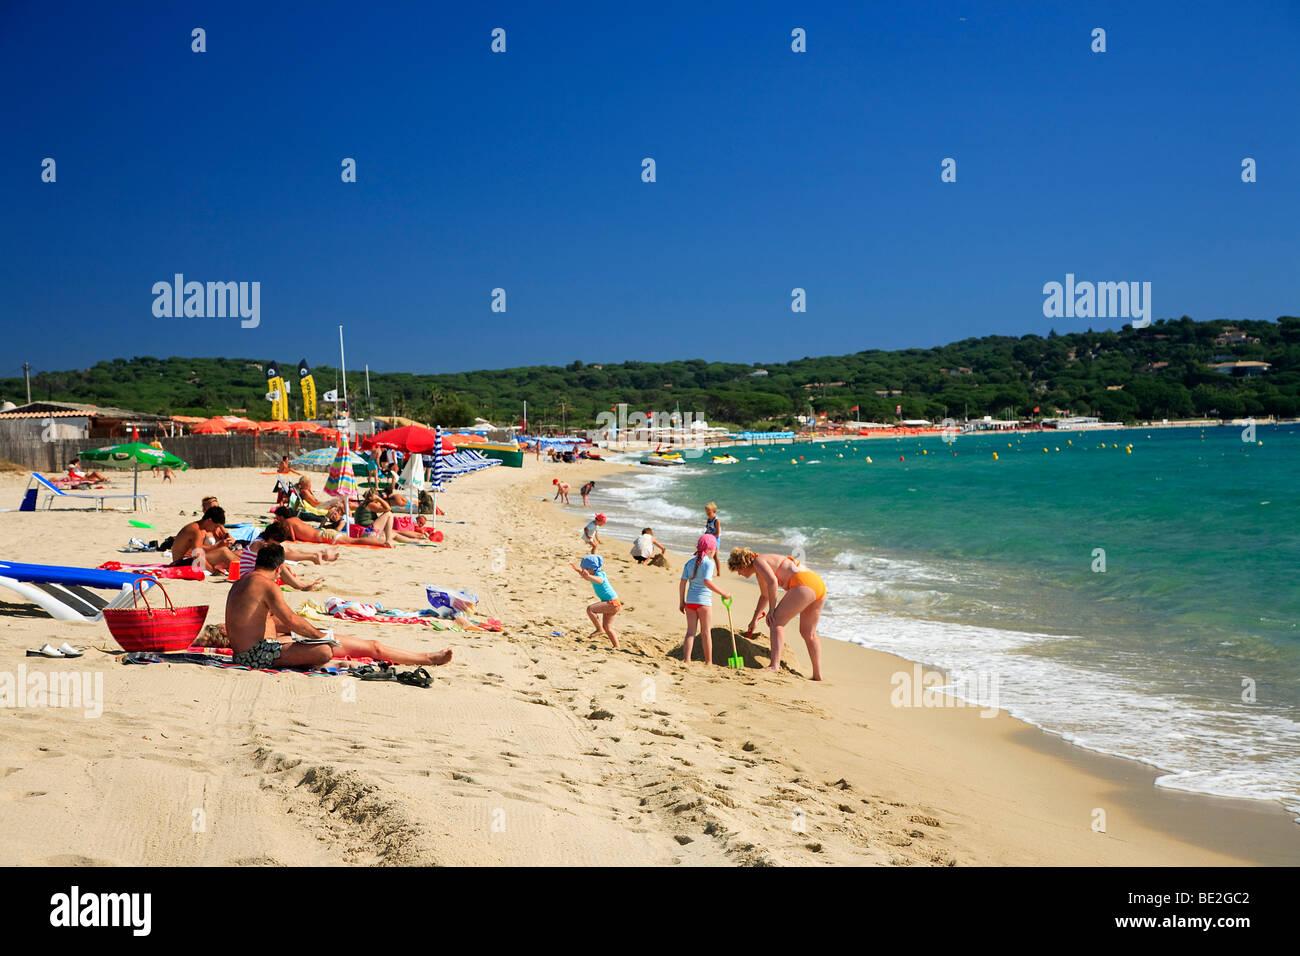 Pampelonne Beach Saint Tropez Var France Stock Photo 25872338